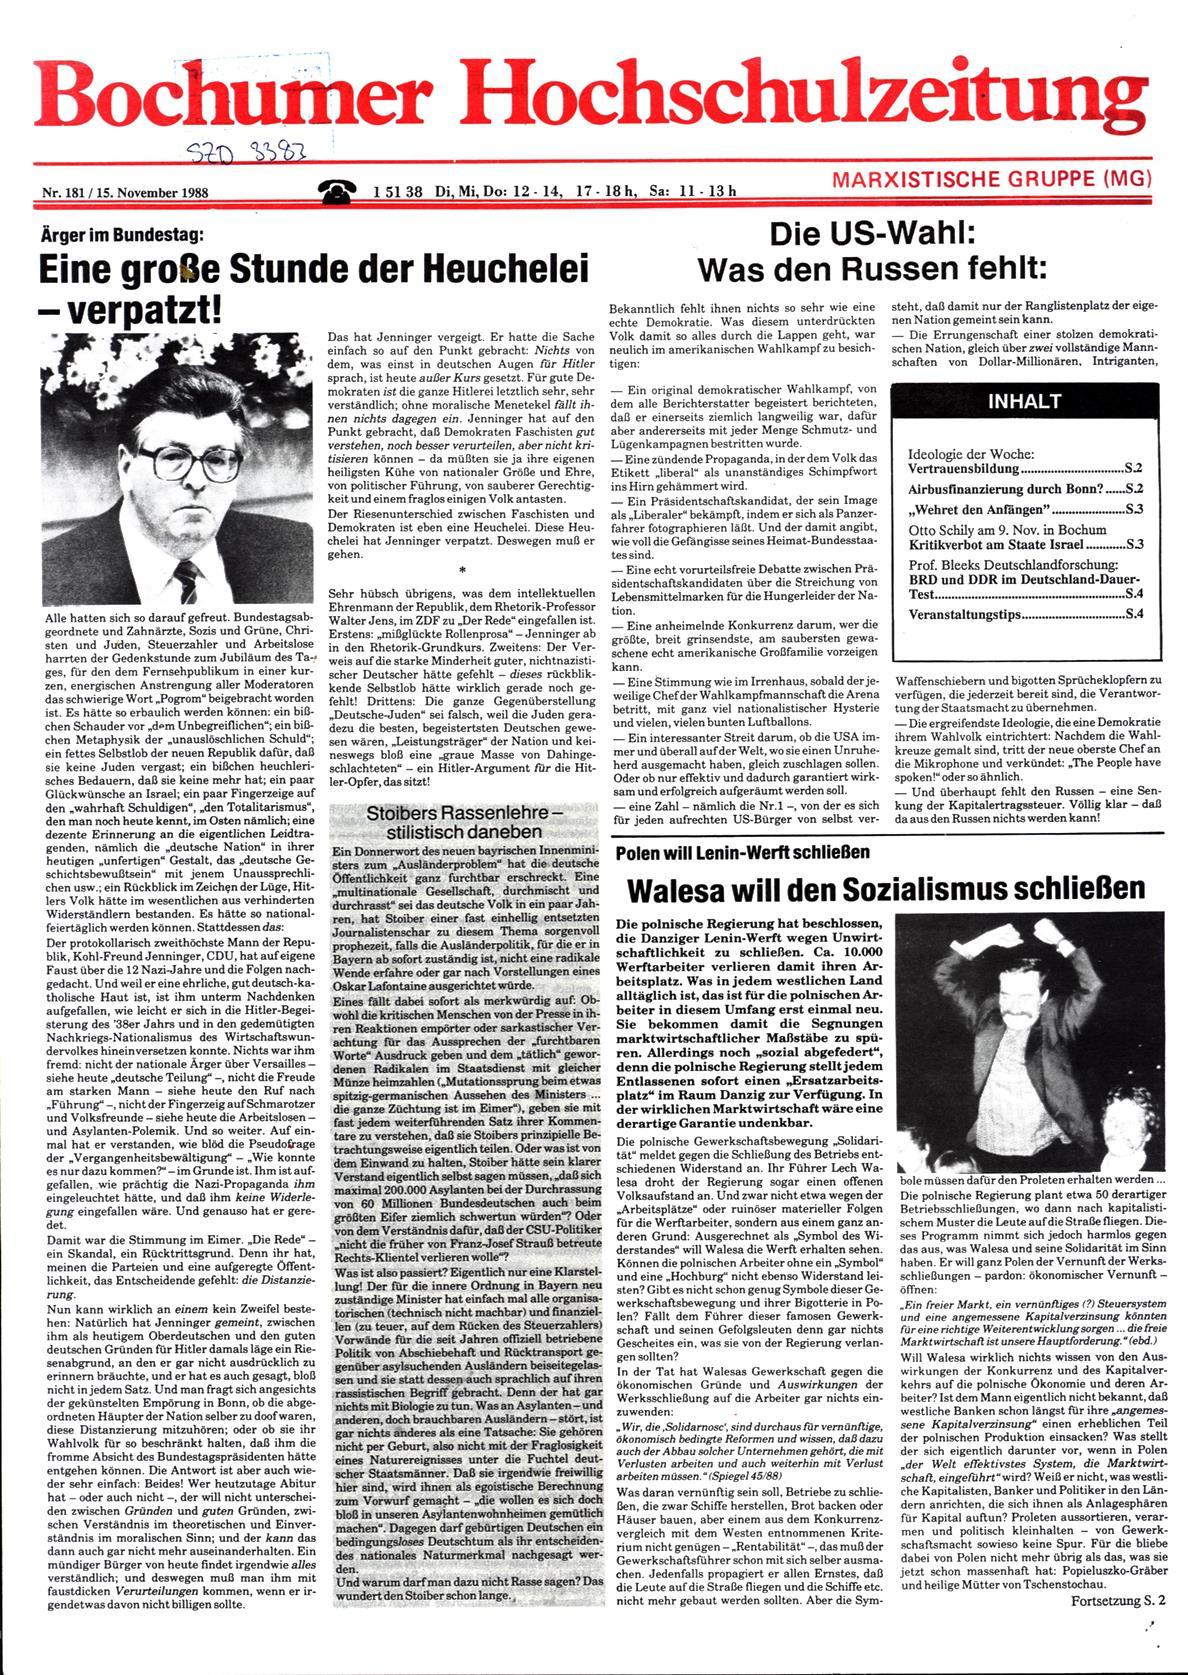 Bochum_BHZ_19881115_181_001